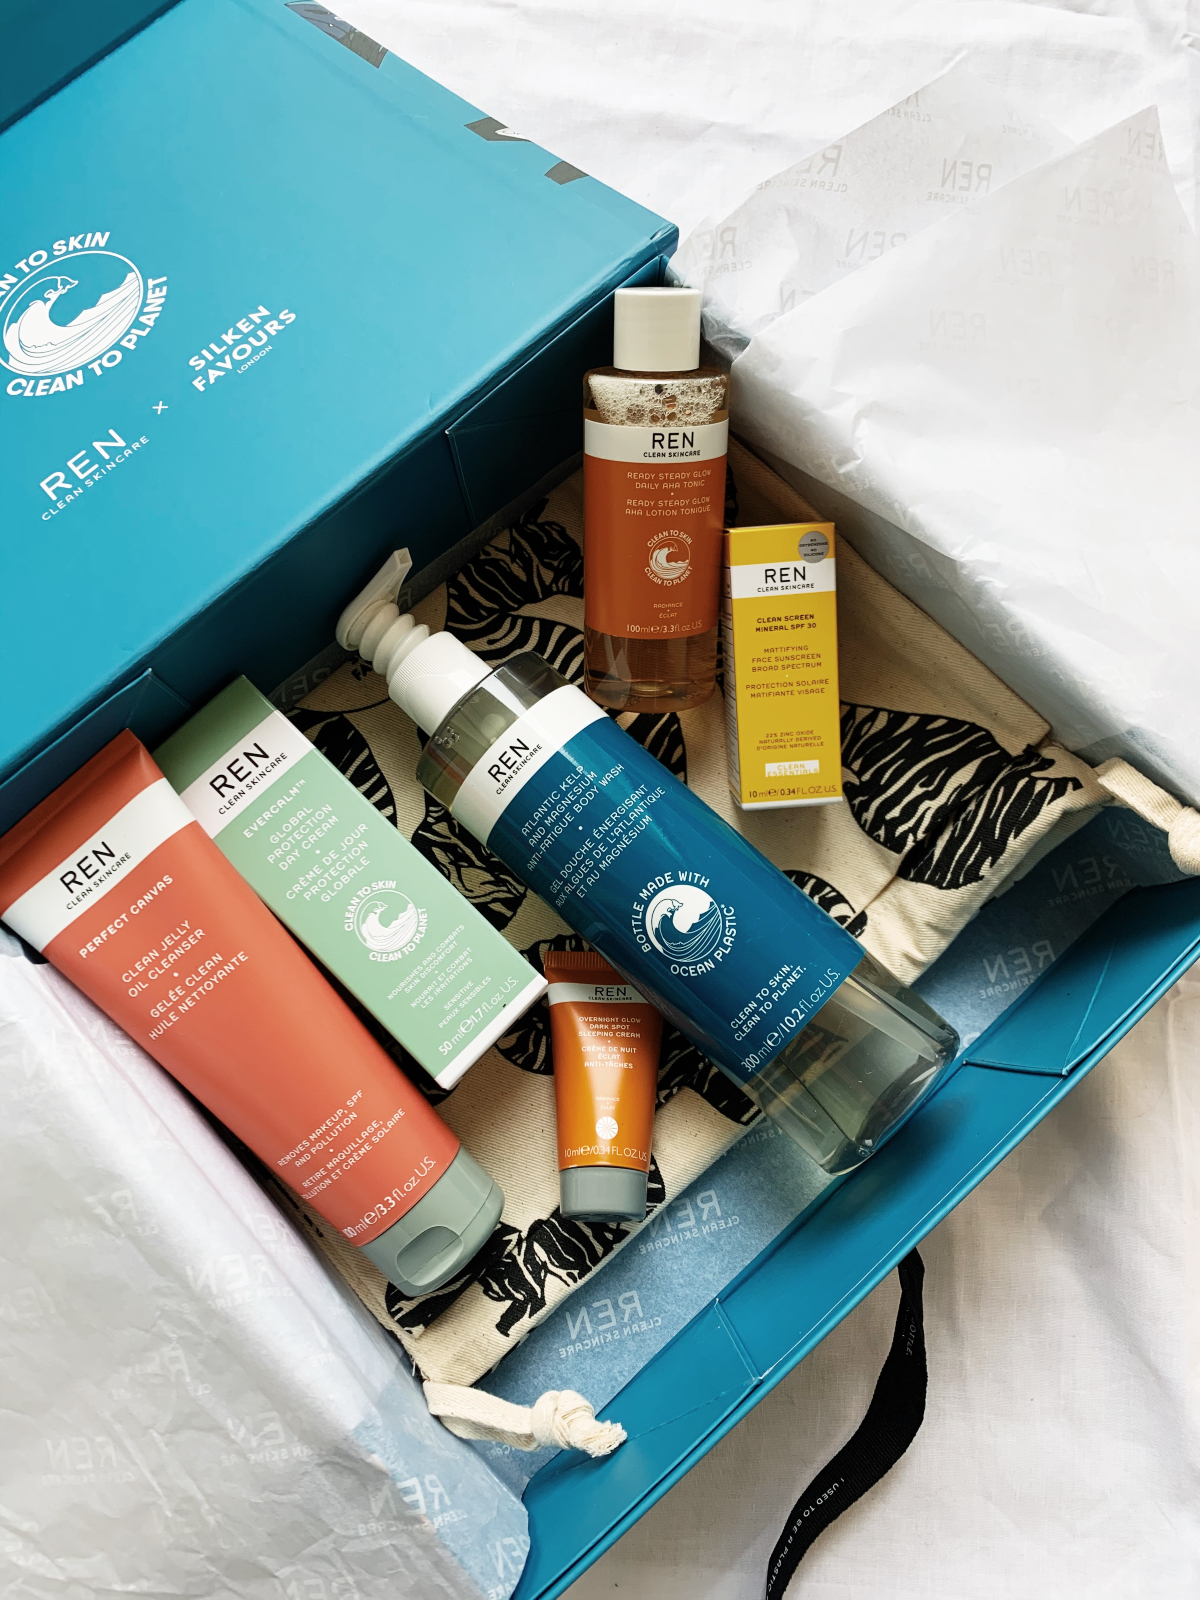 REN X Selfridges Project Earth Pop Up Shop and Beauty Box